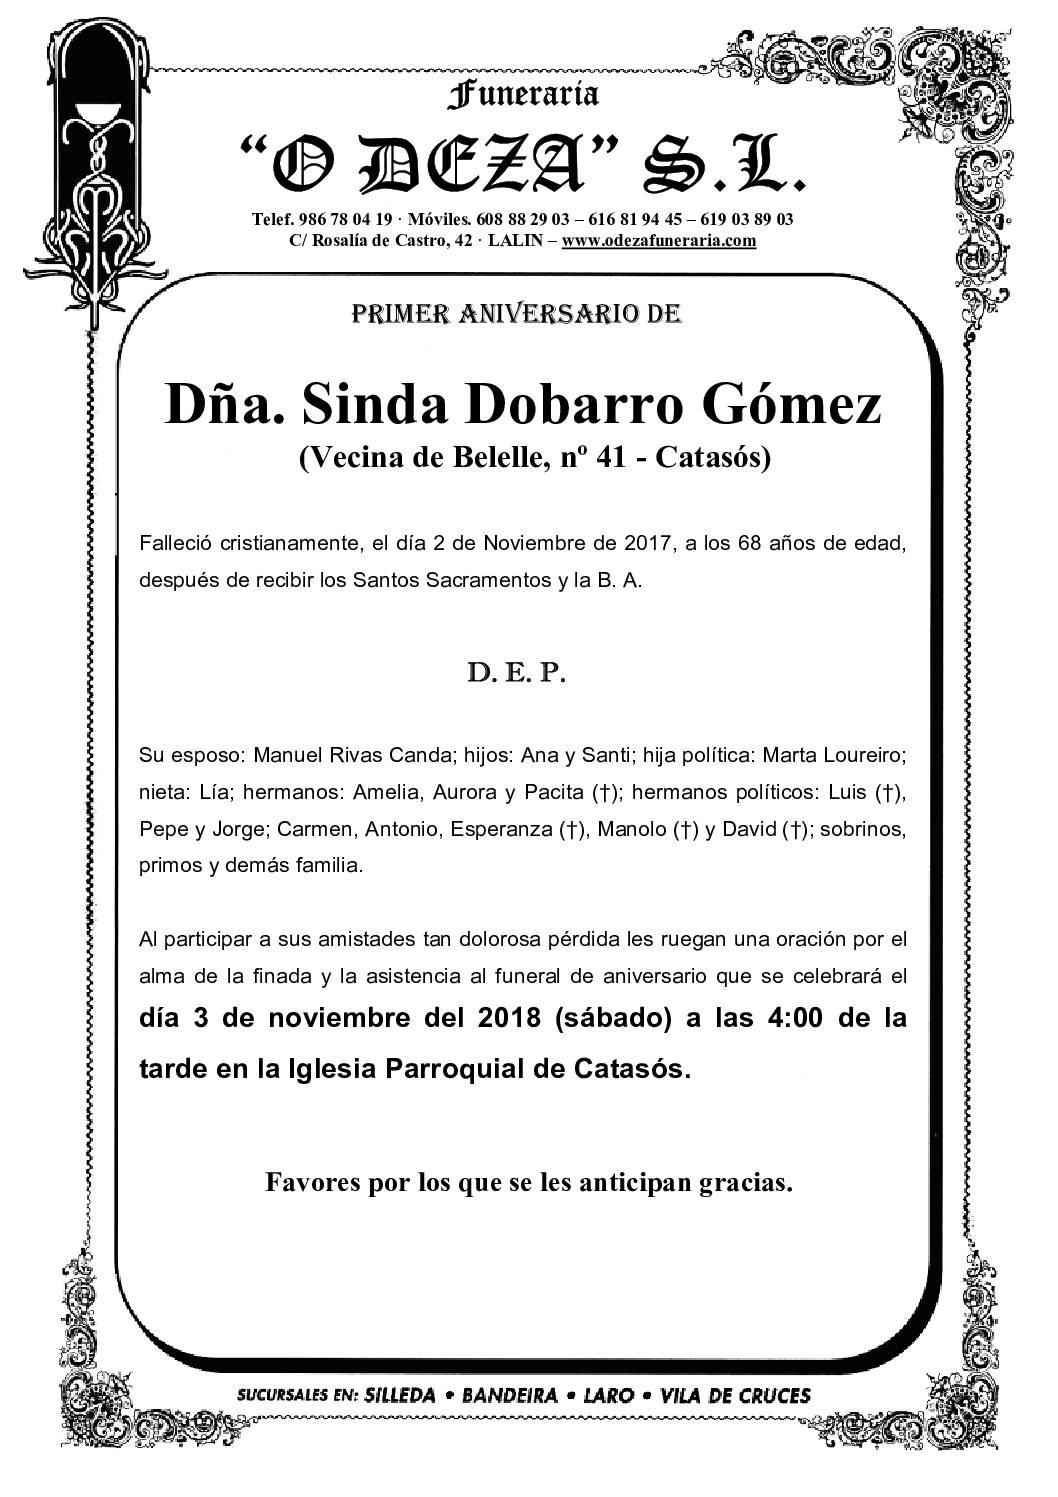 DÑA. SINDA DOBARRO GÓMEZ